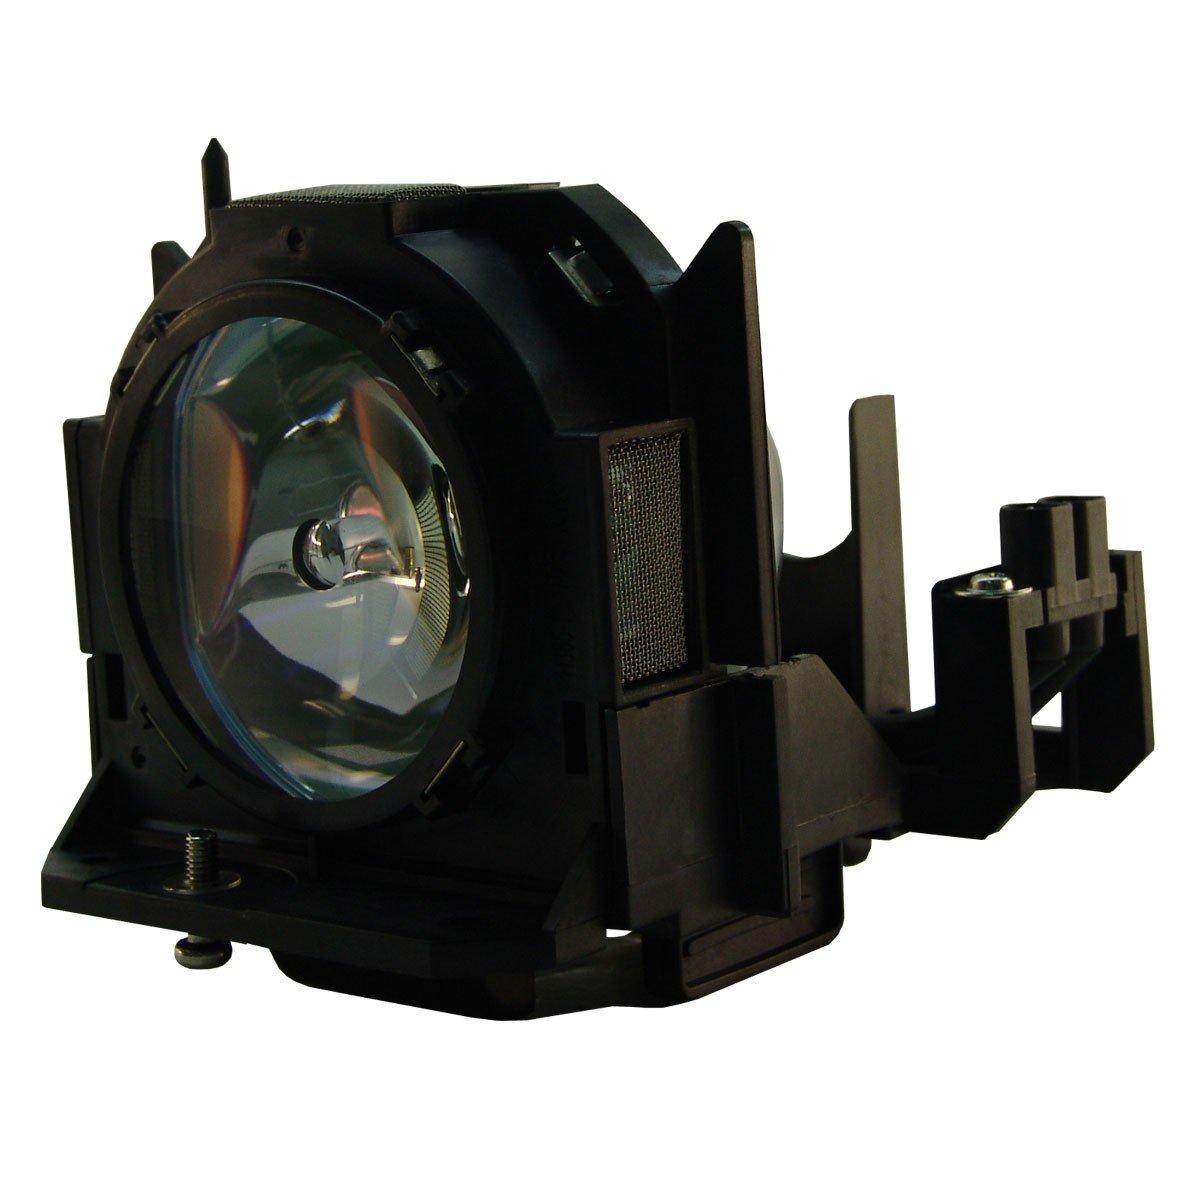 Panasonic ET-LAD60A 交換用ランプ B005PXRKN2